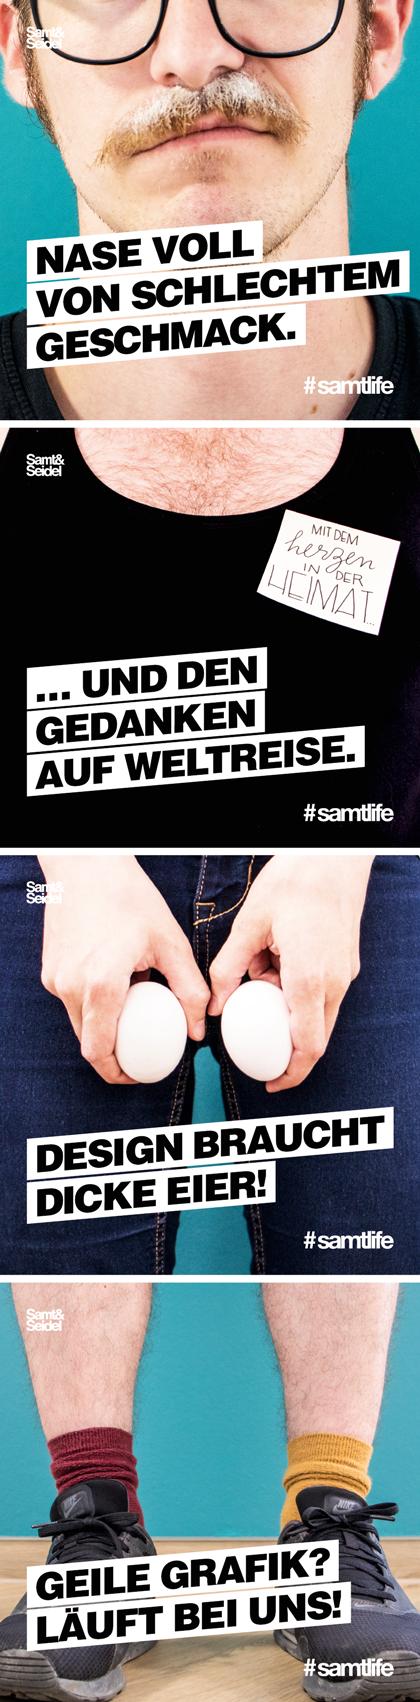 Samt&Seidel_Web_Referenz_Advertainment_THAK_Forum_00